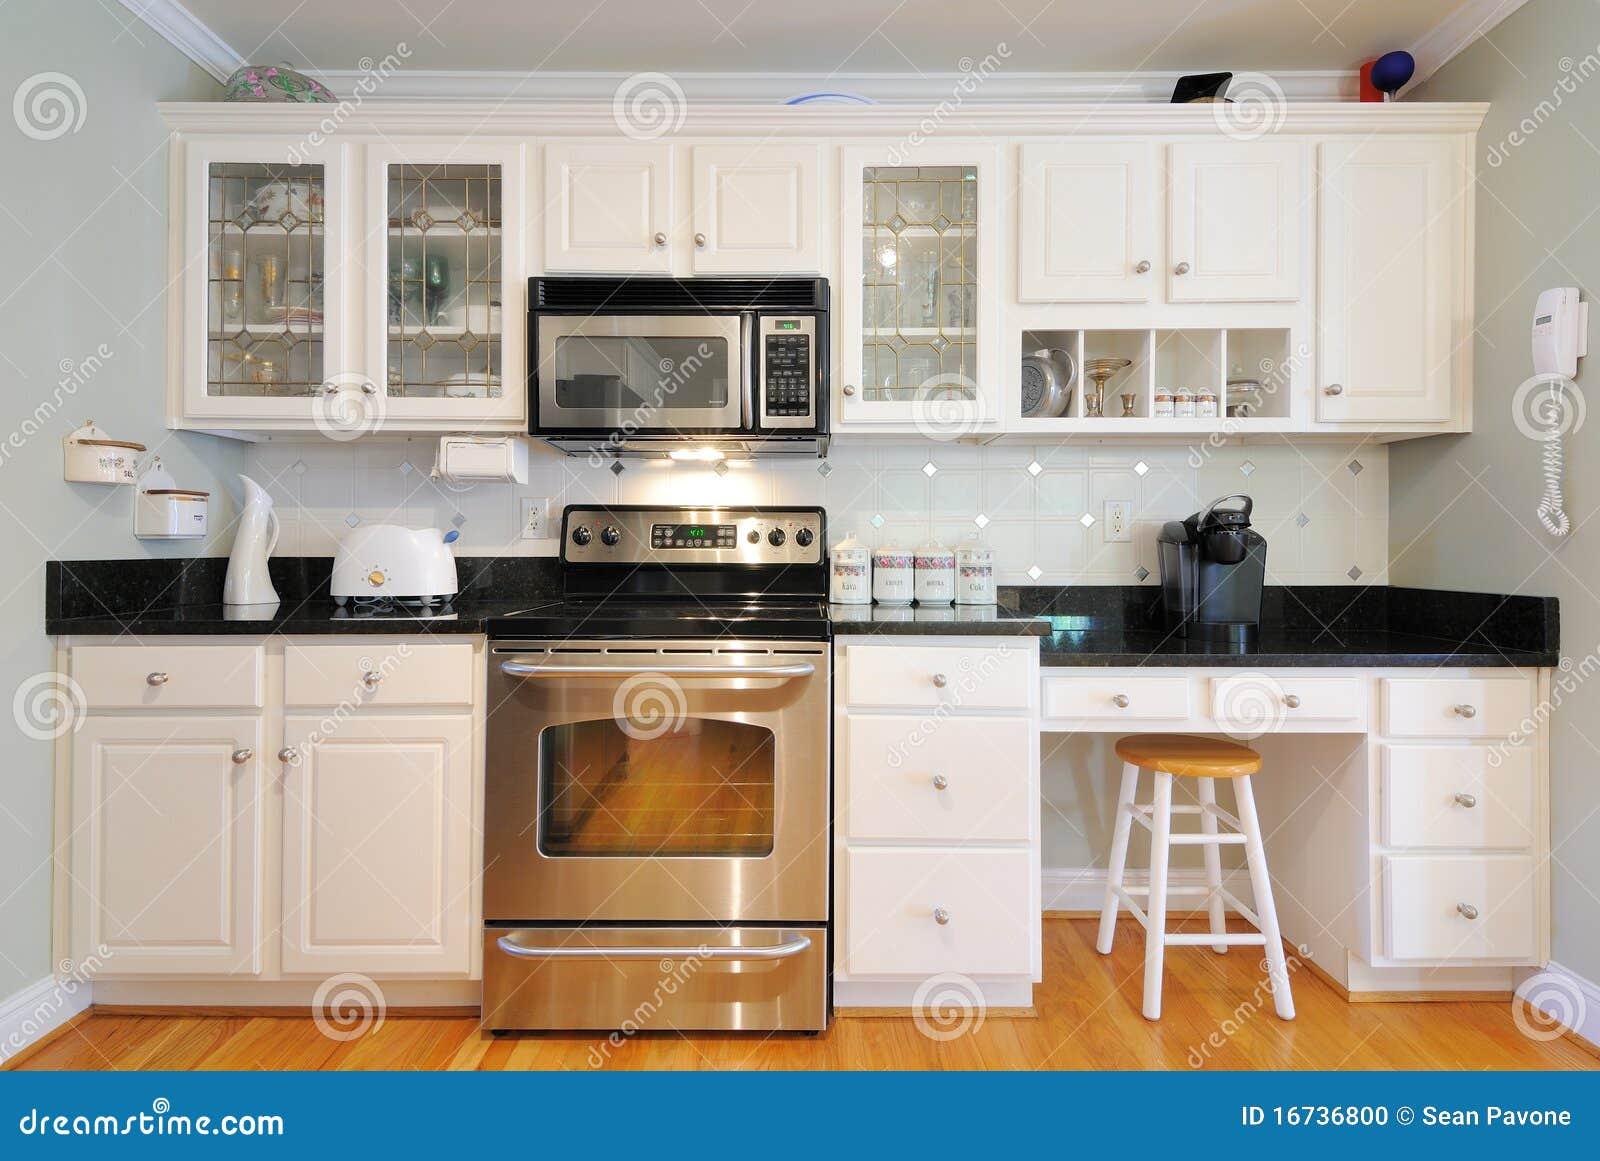 Moderne zwarte keuken stock foto's– 420 moderne zwarte keuken ...